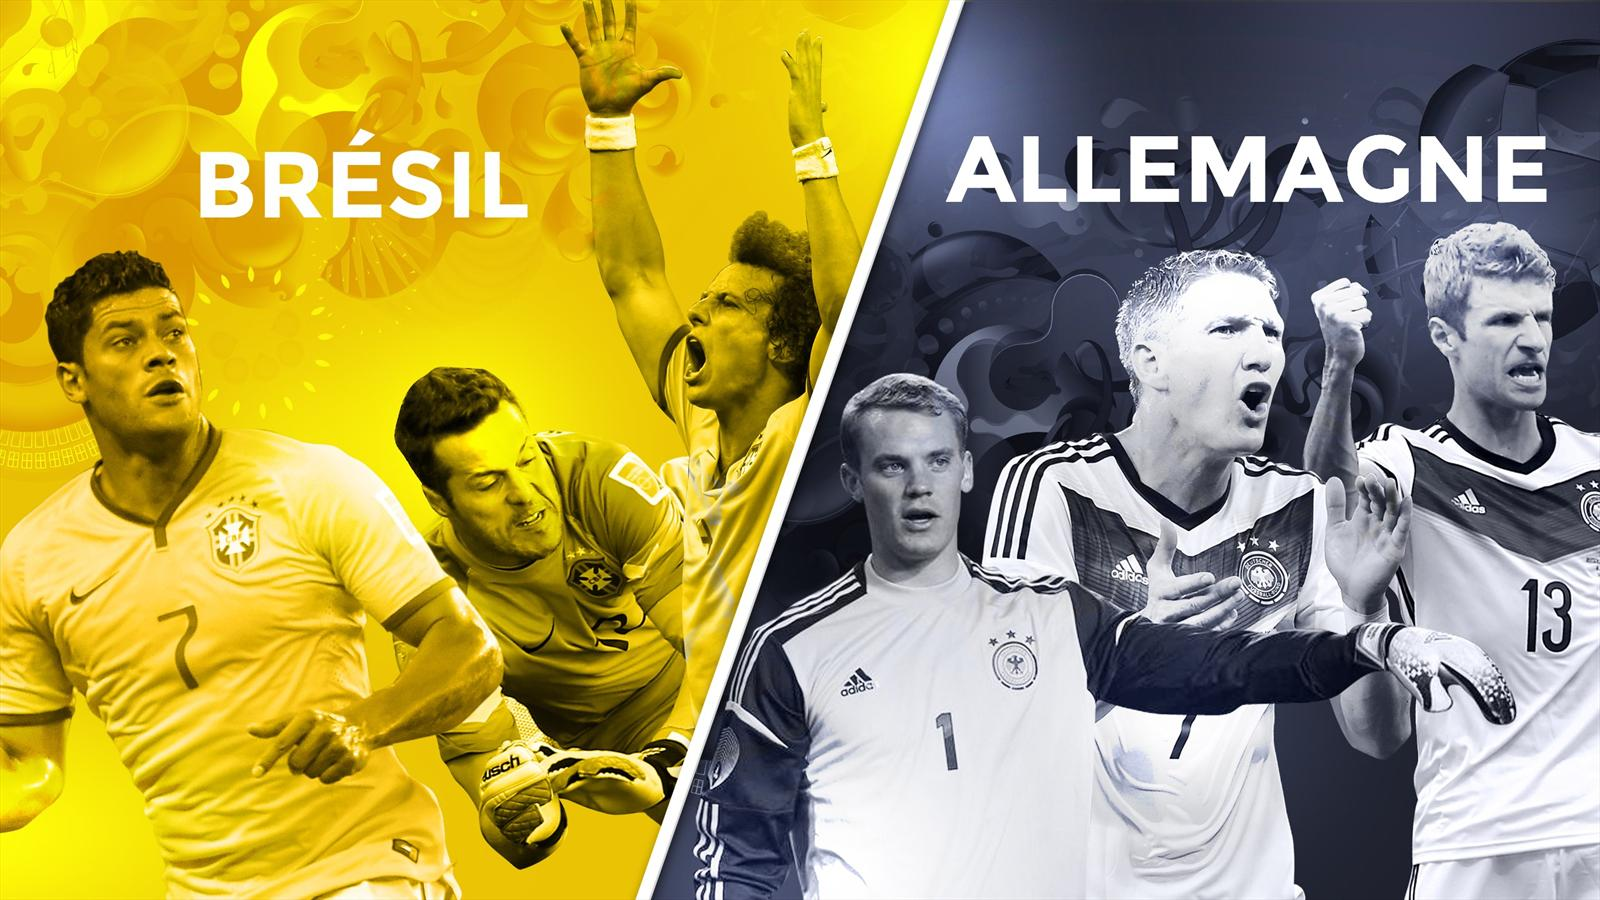 Match Bresil vs Allemagne